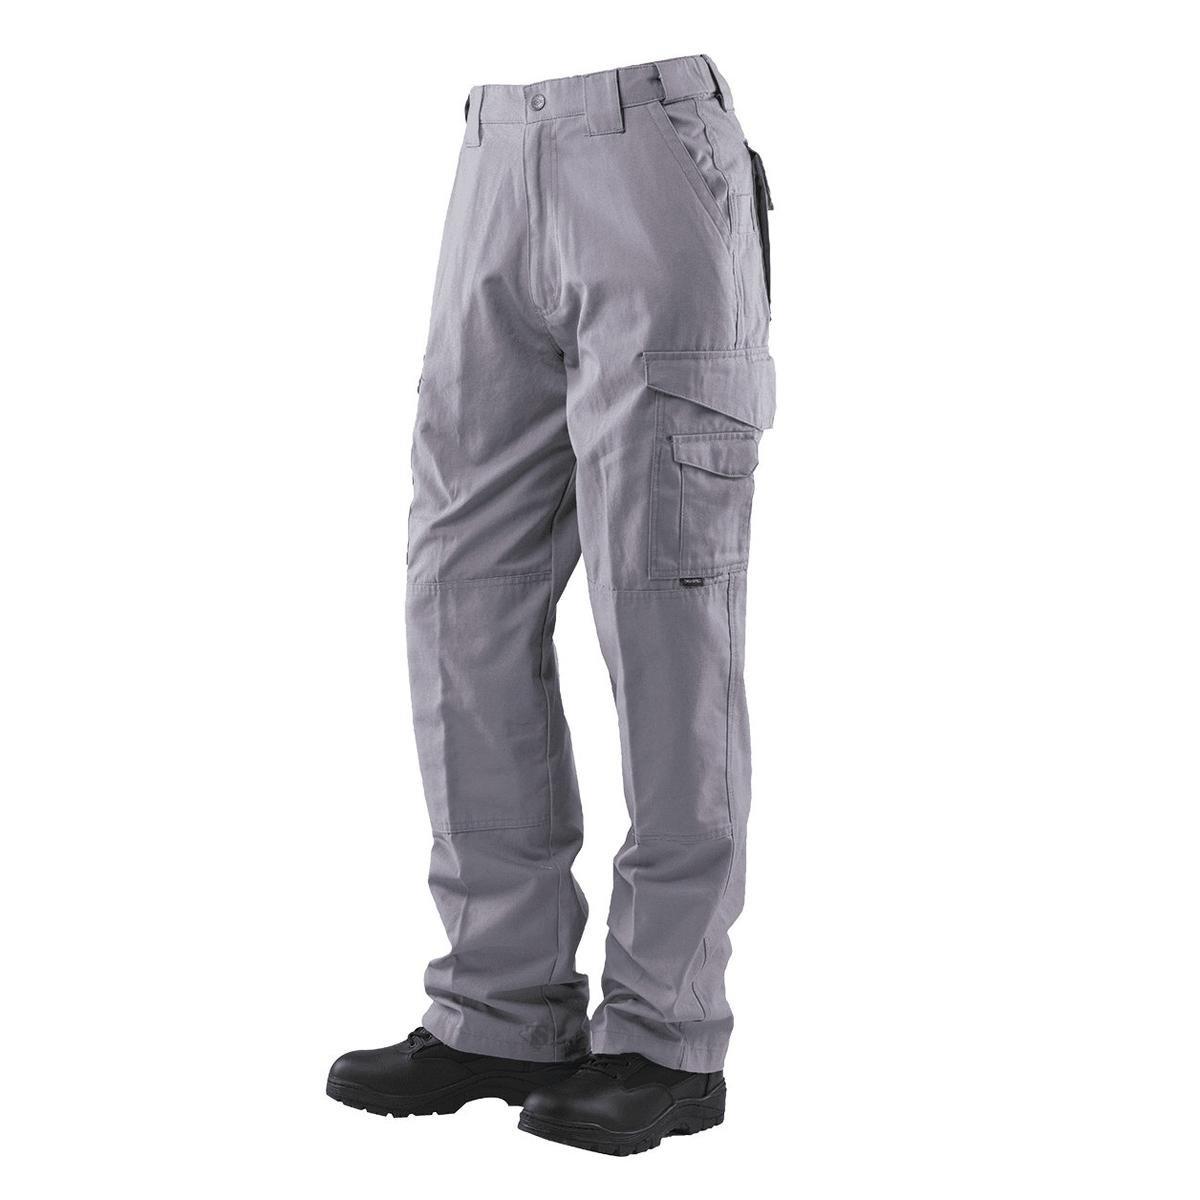 Tru-Spec 1089 Mens 24-7 Lightweight Tactical Pants, Light Grey Altanco